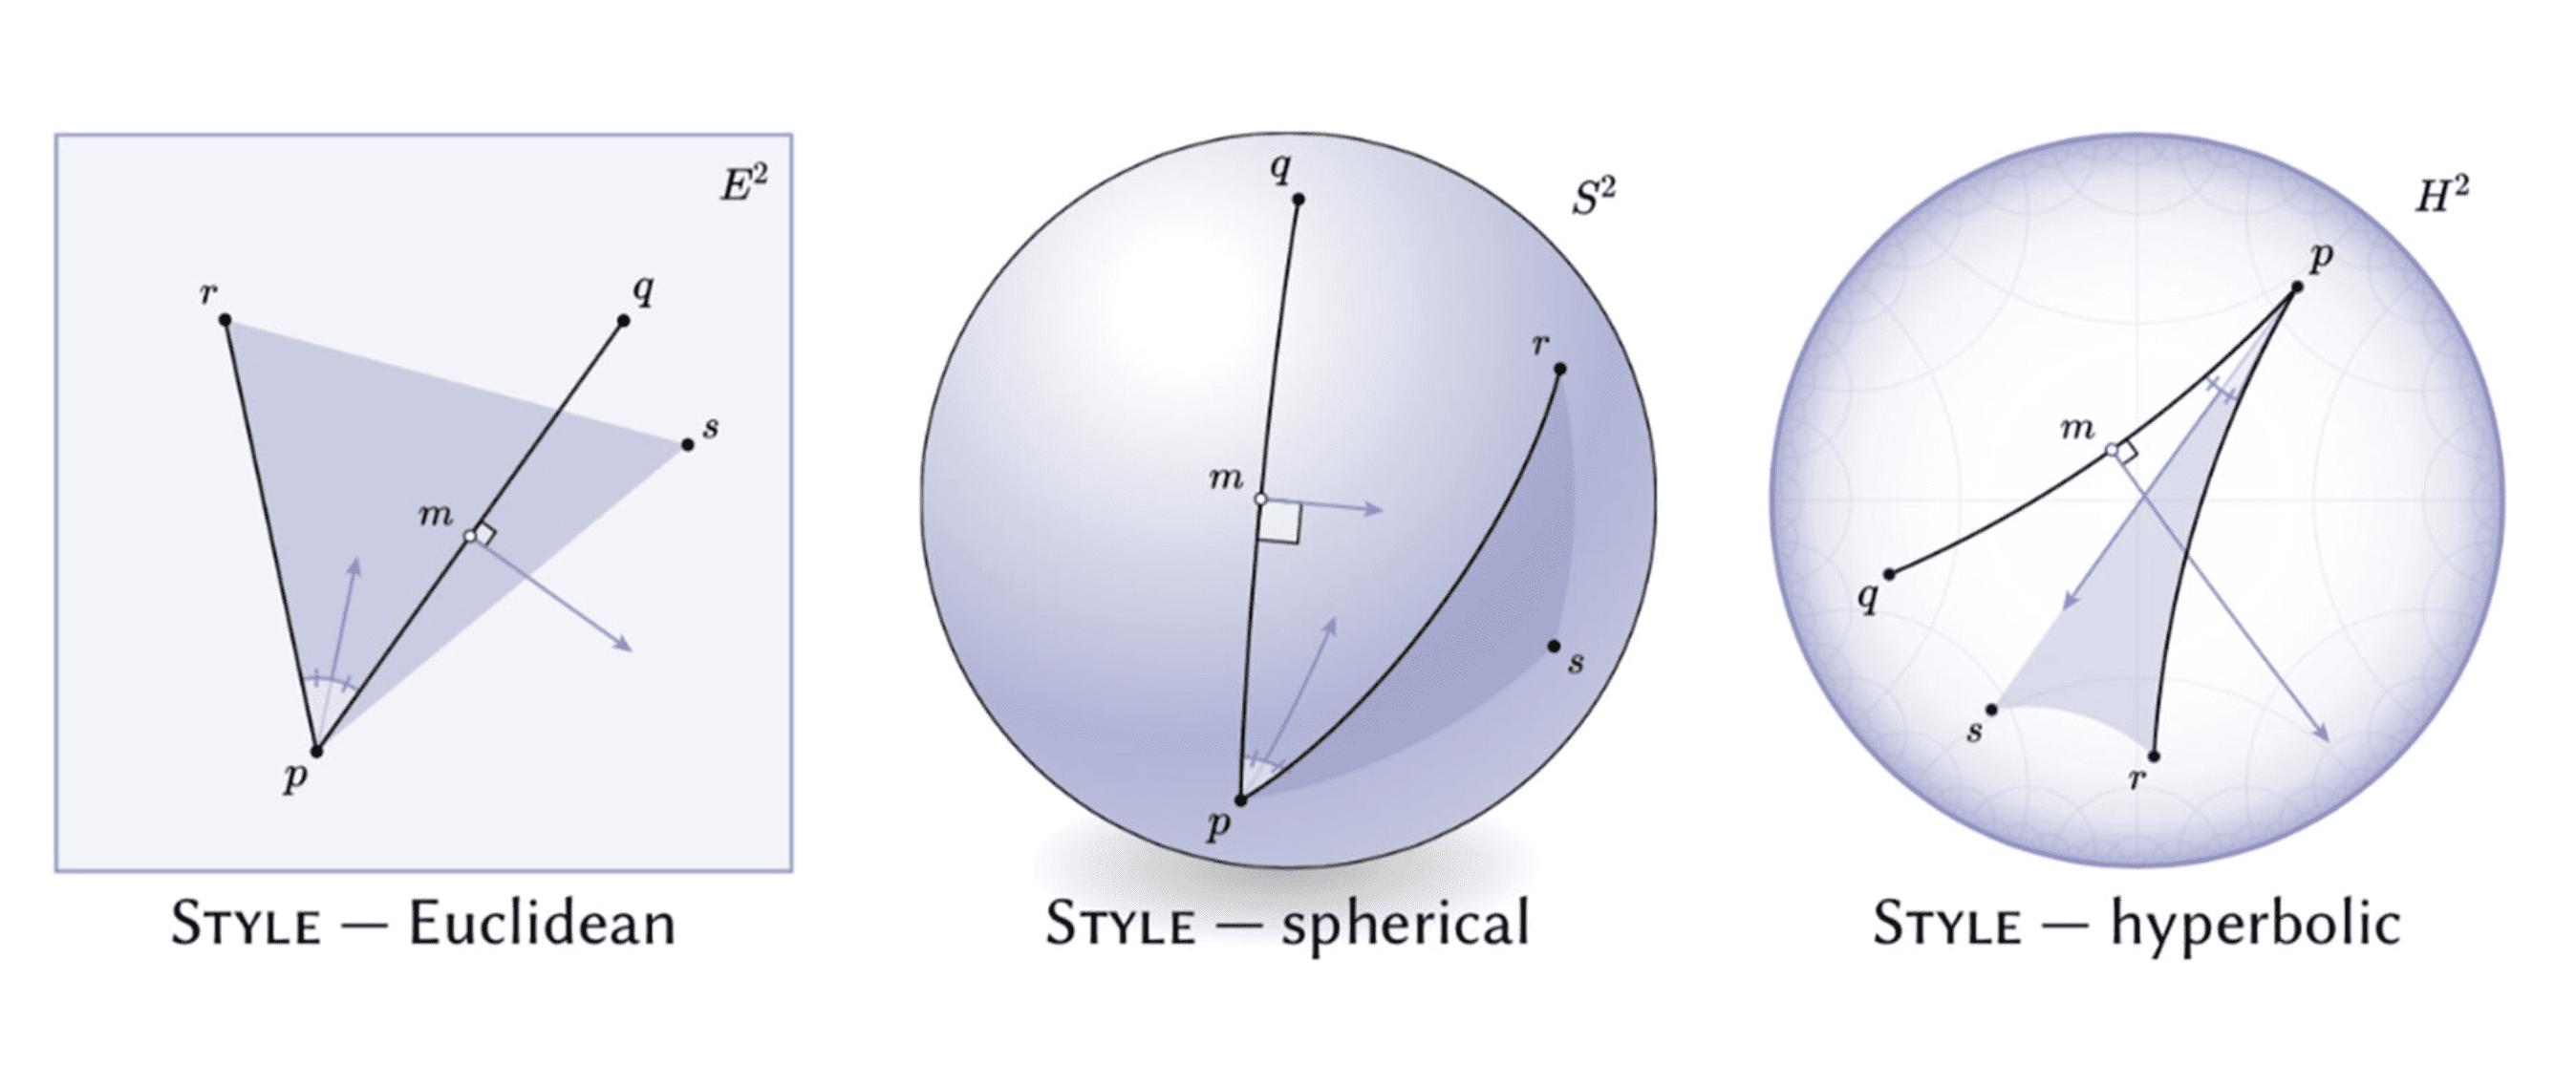 Penrose: il software che traduce in immagini formule matematiche complesse